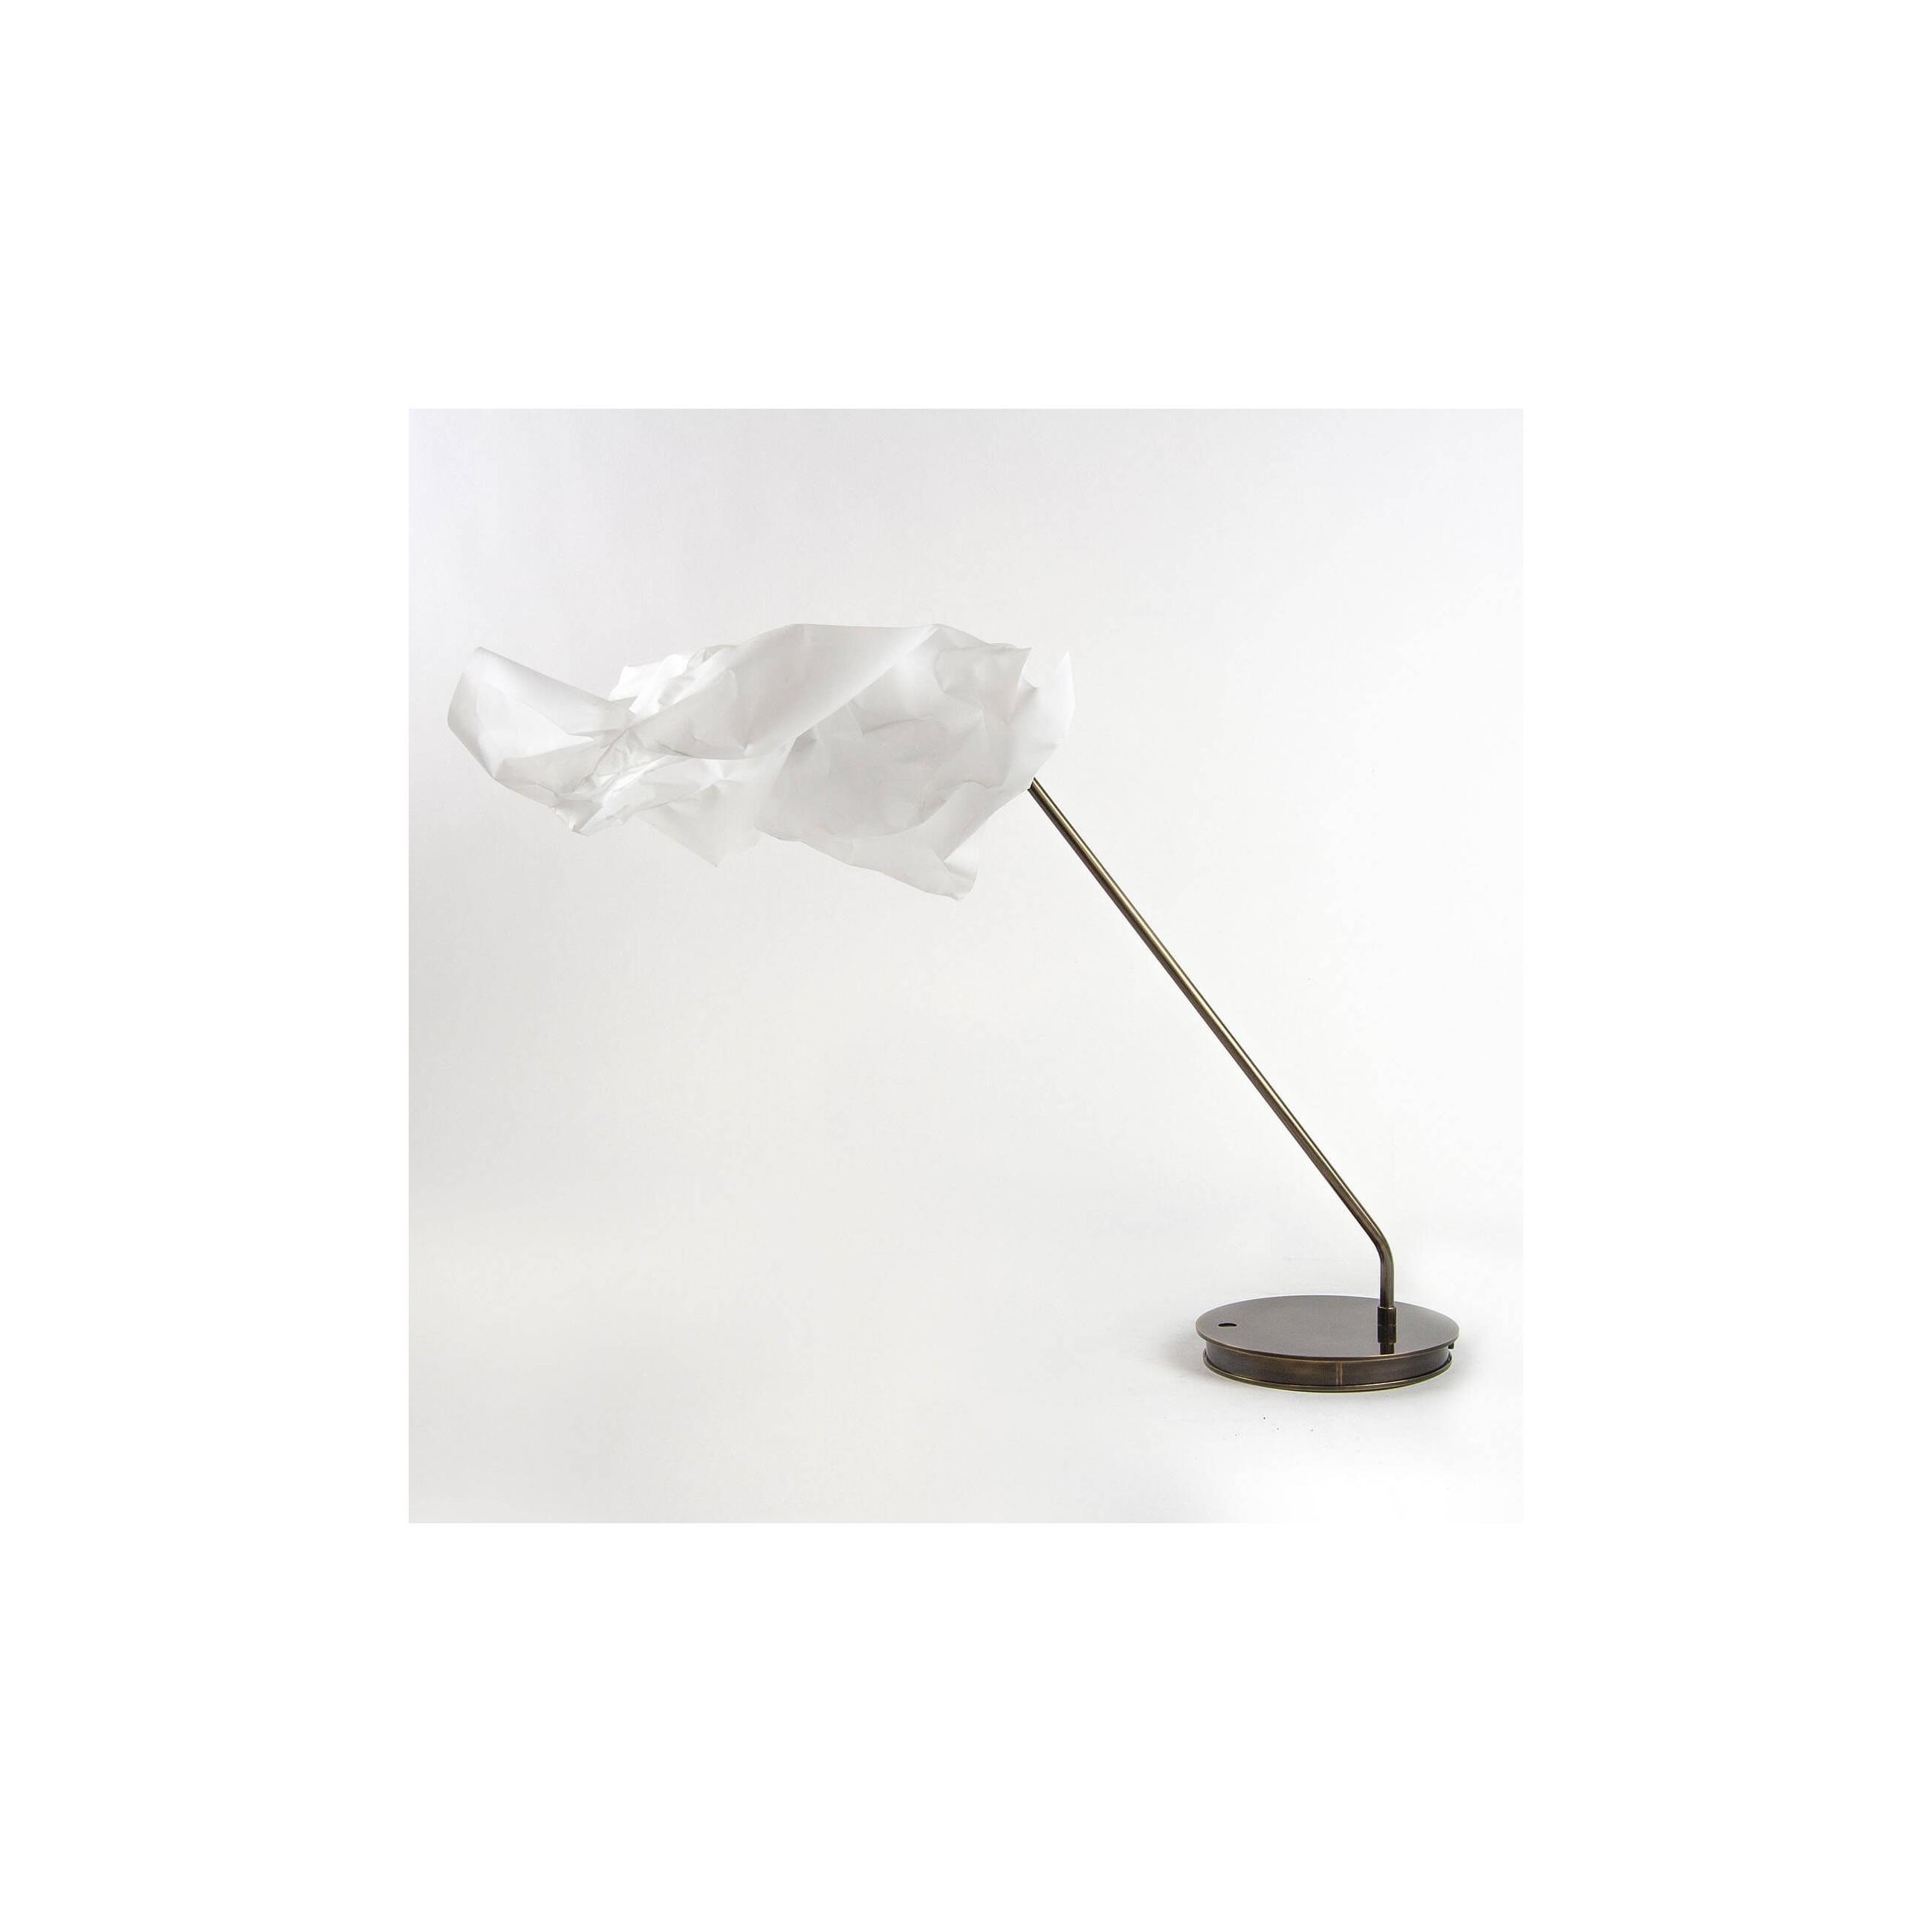 image led lamp desk lady by koncept